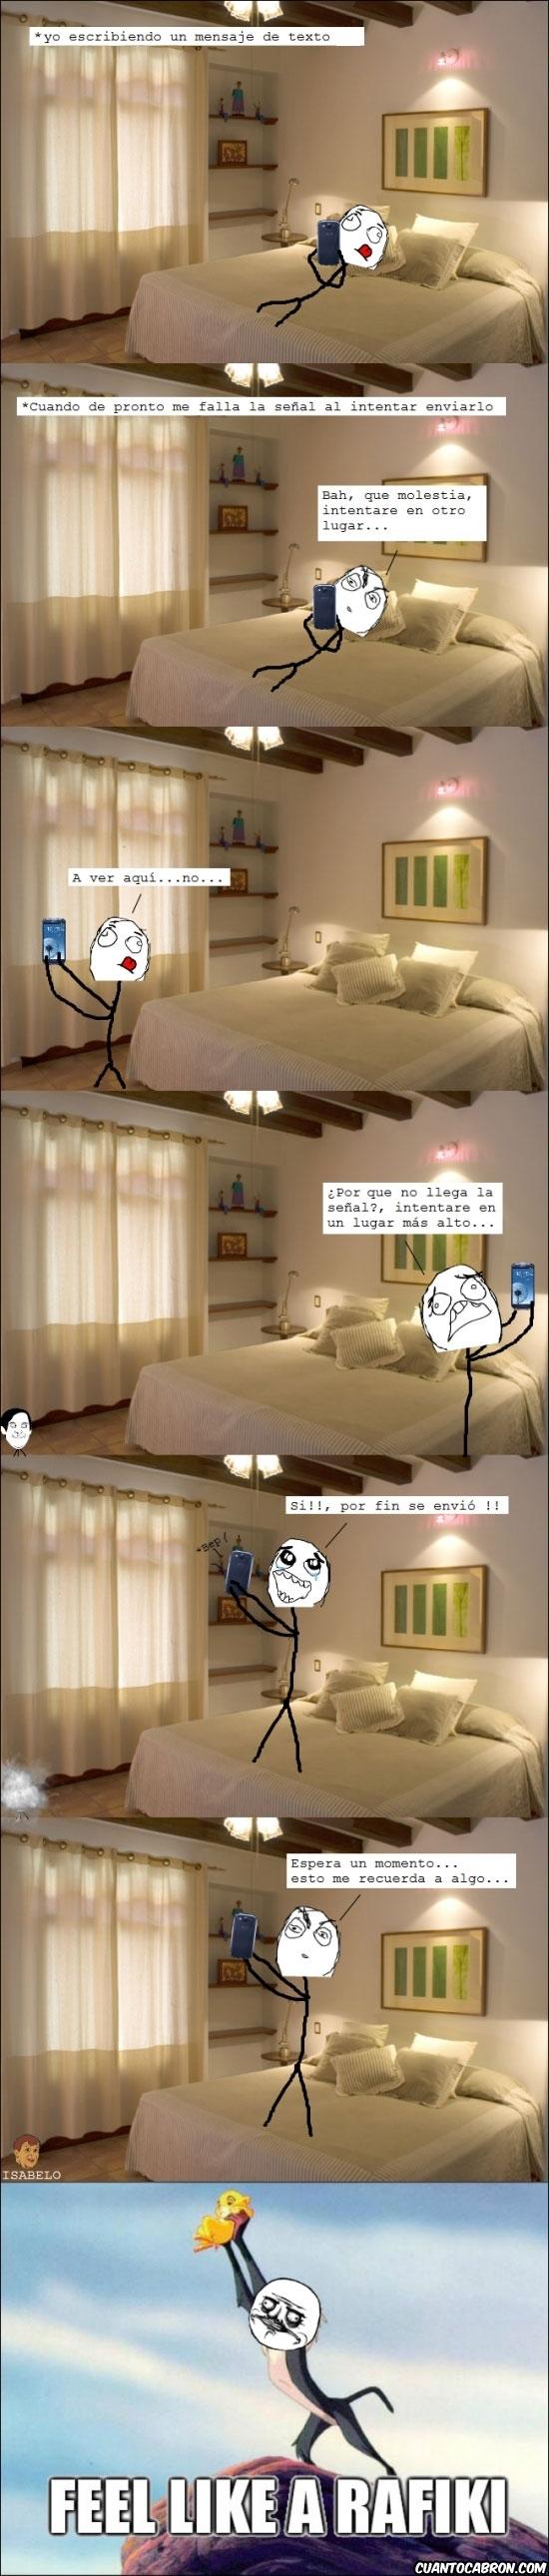 cama,cobertura,habitacion,happy,me gusta,mensaje,movil,Rafiki,rey leon,s3,señal